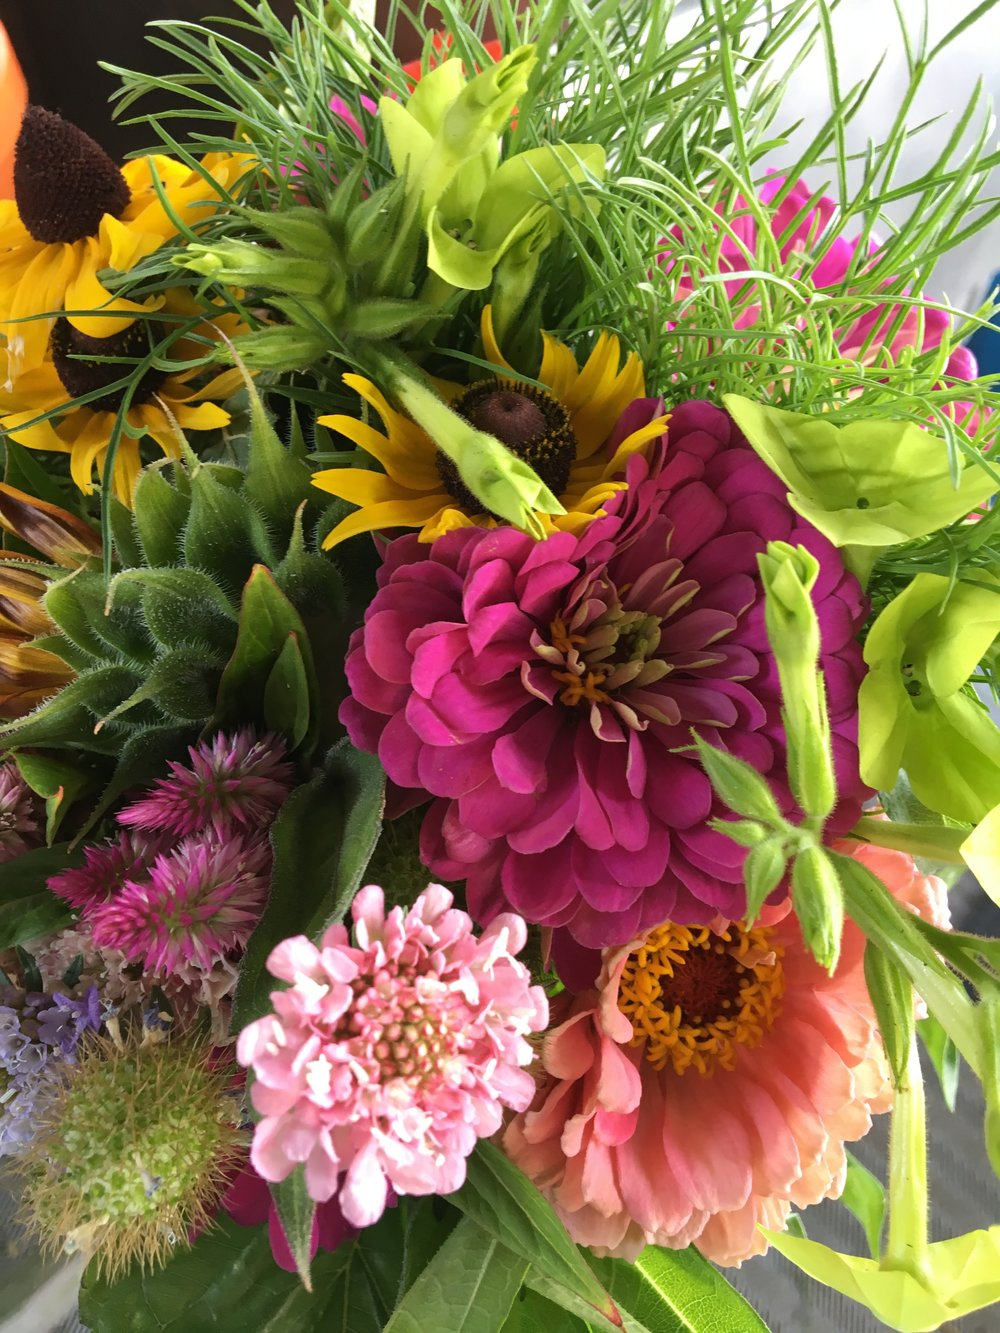 Flower CSA Photo July 22 2017.jpg